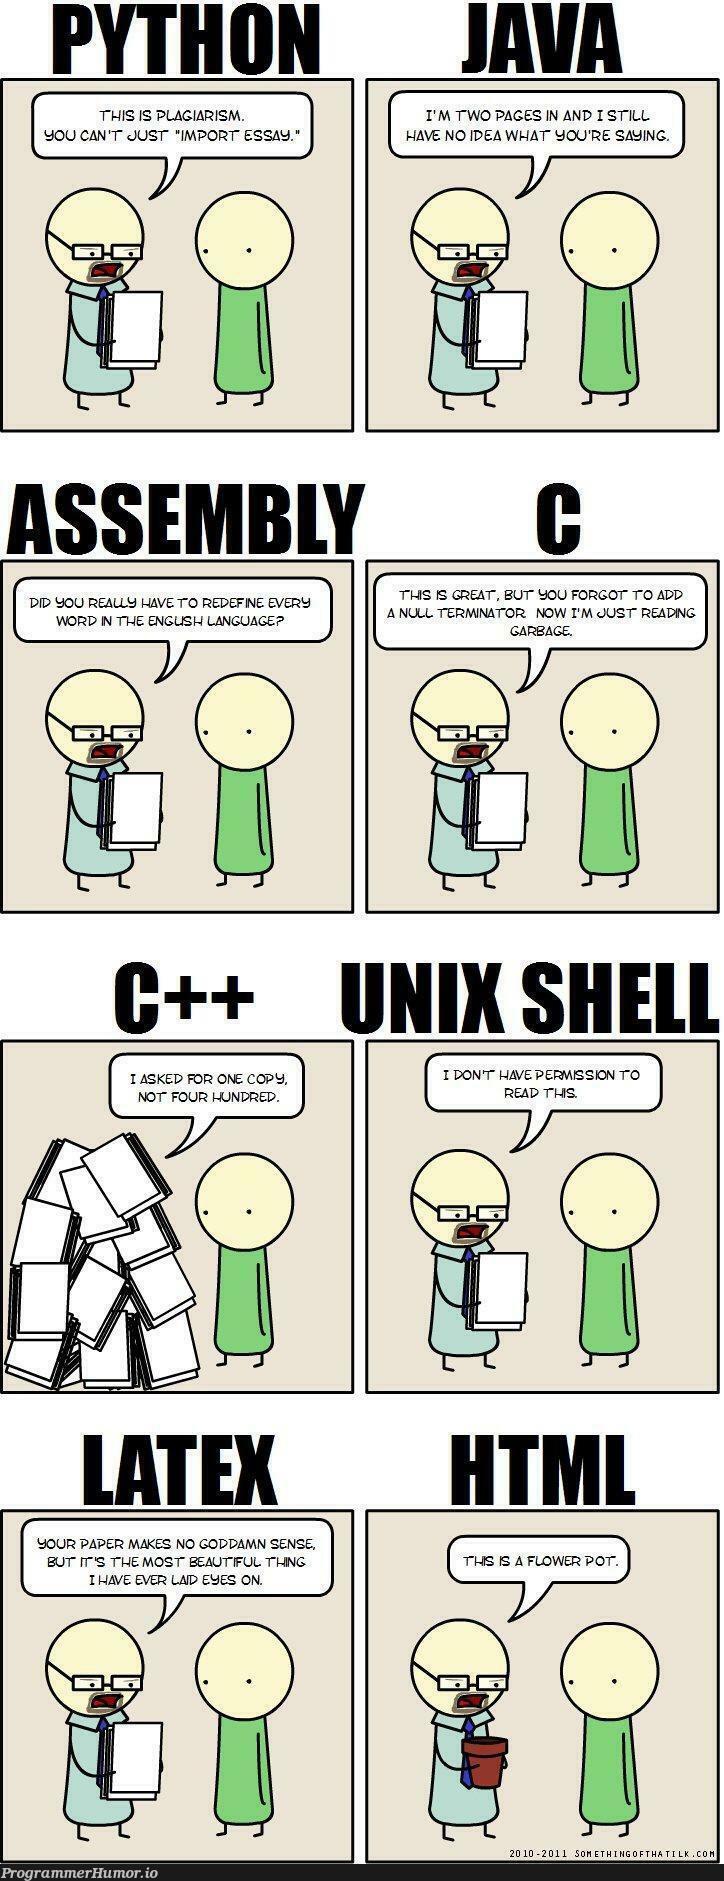 Languages in a nutshell | java-memes, python-memes, shell-memes, idea-memes, ide-memes, language-memes | ProgrammerHumor.io